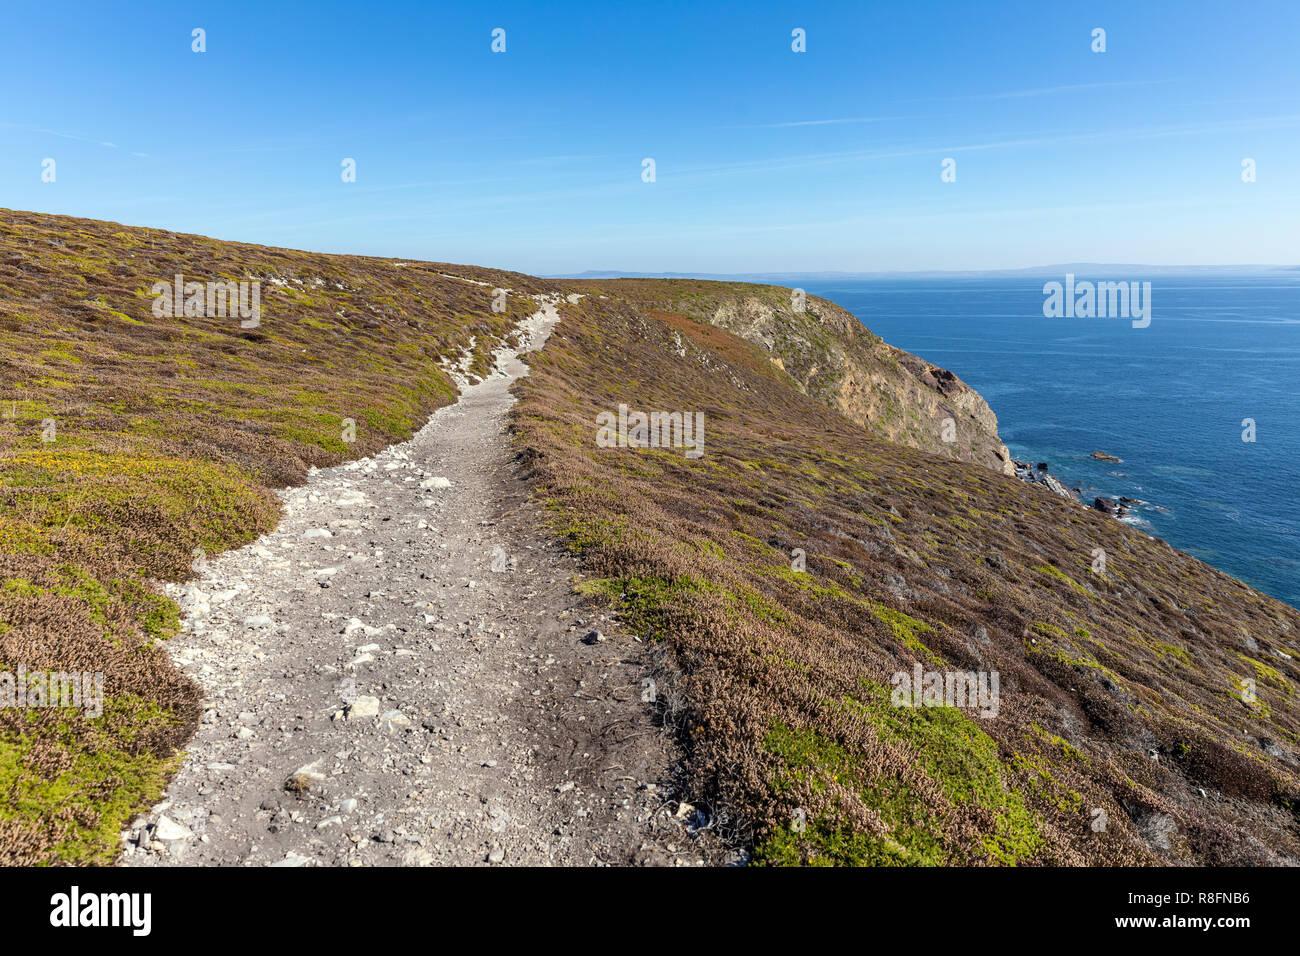 Coastal path of the Cap de la Chevre on the Crozon Peninsula (Finistere, France) - Stock Image